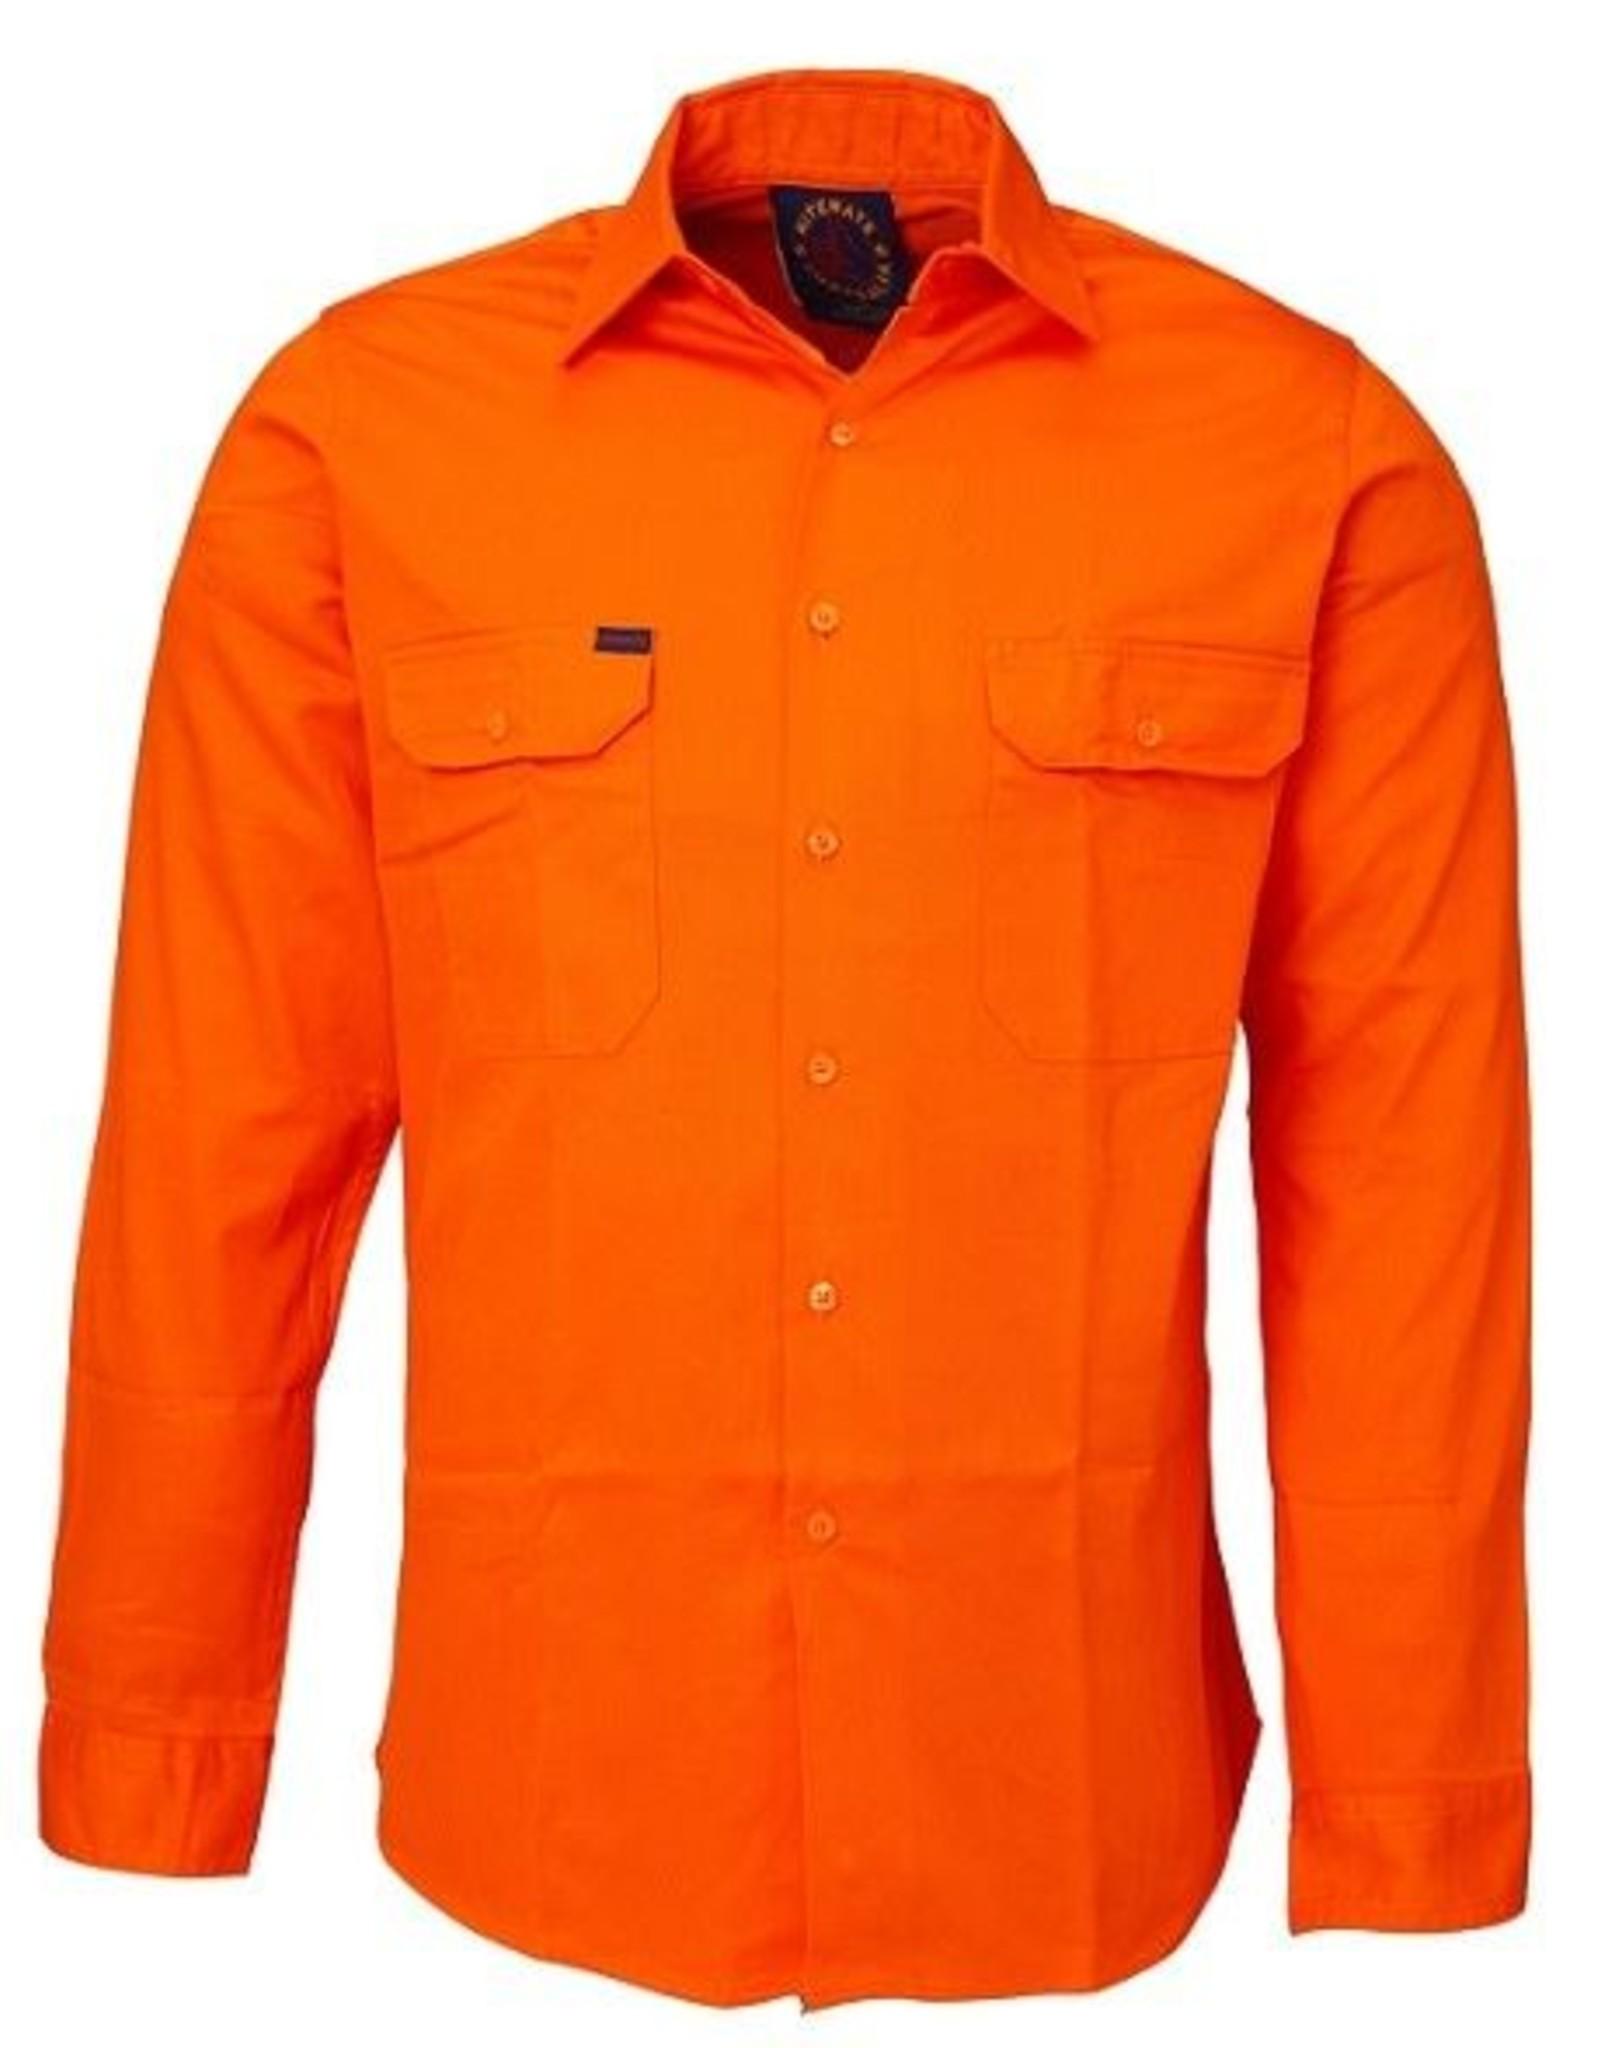 Ritemate Ritemate RM1000 Cotton Twill LS Work Shirt